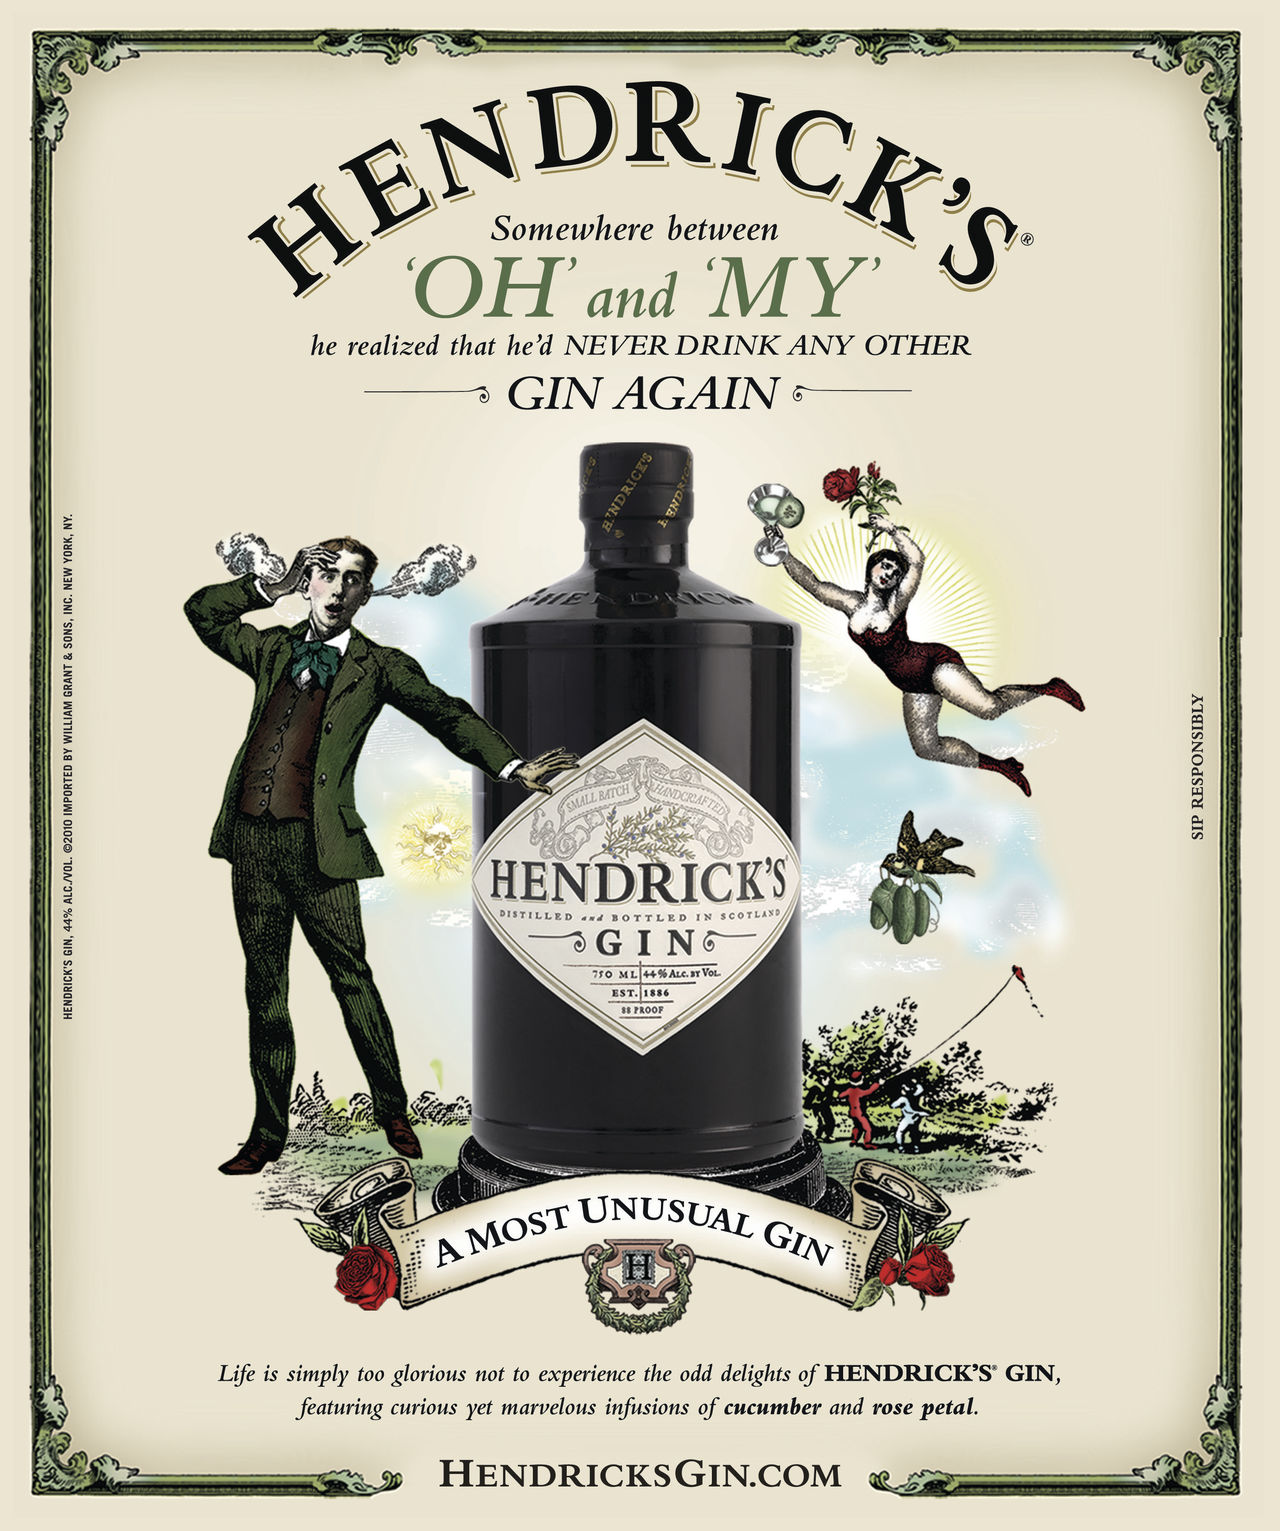 hendrick_s_ad_2010_large.jpg